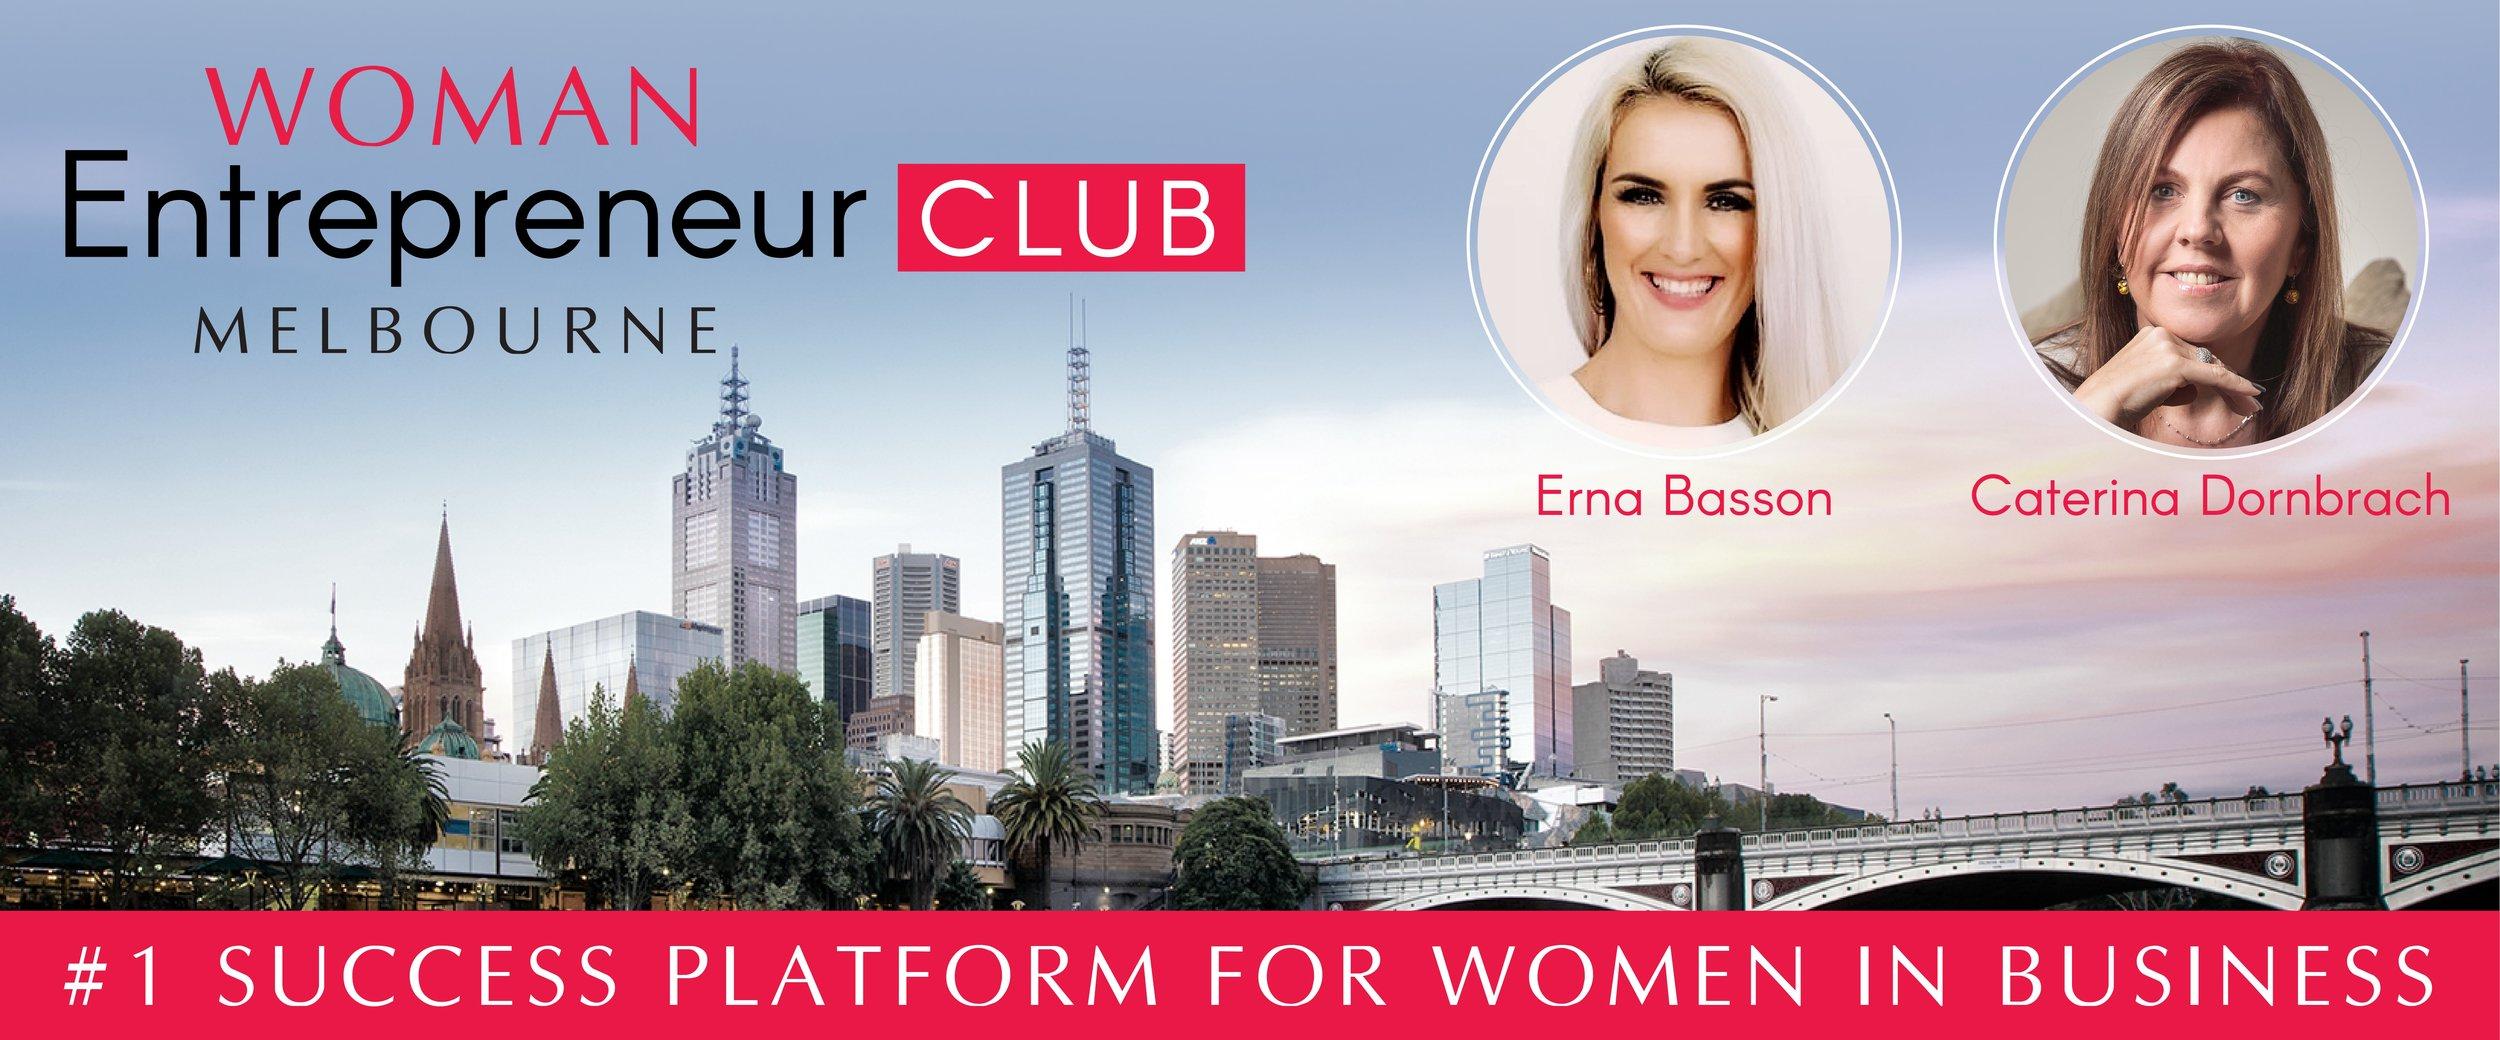 Woman Entrepreneur Club - Melbourne-01 (2).jpg